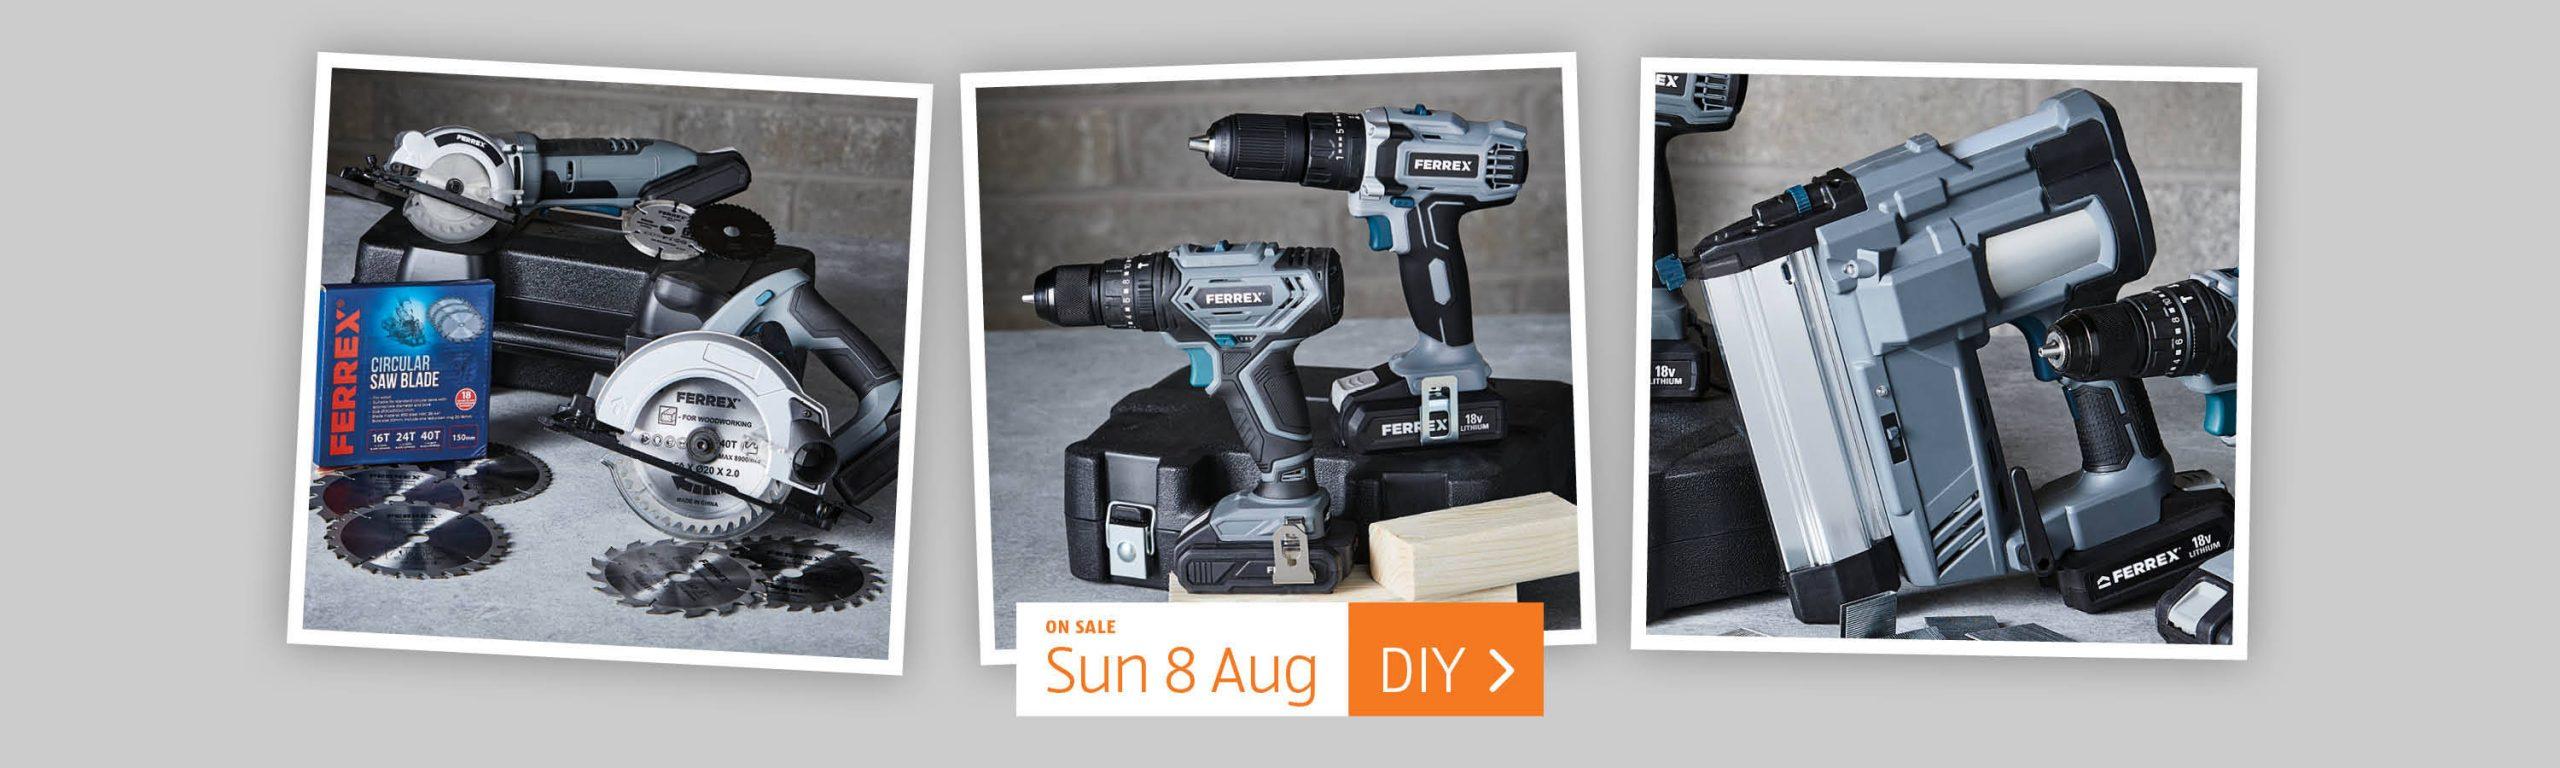 ALDI Sunday Offers 8th August 2021 ALDI DIY Tools